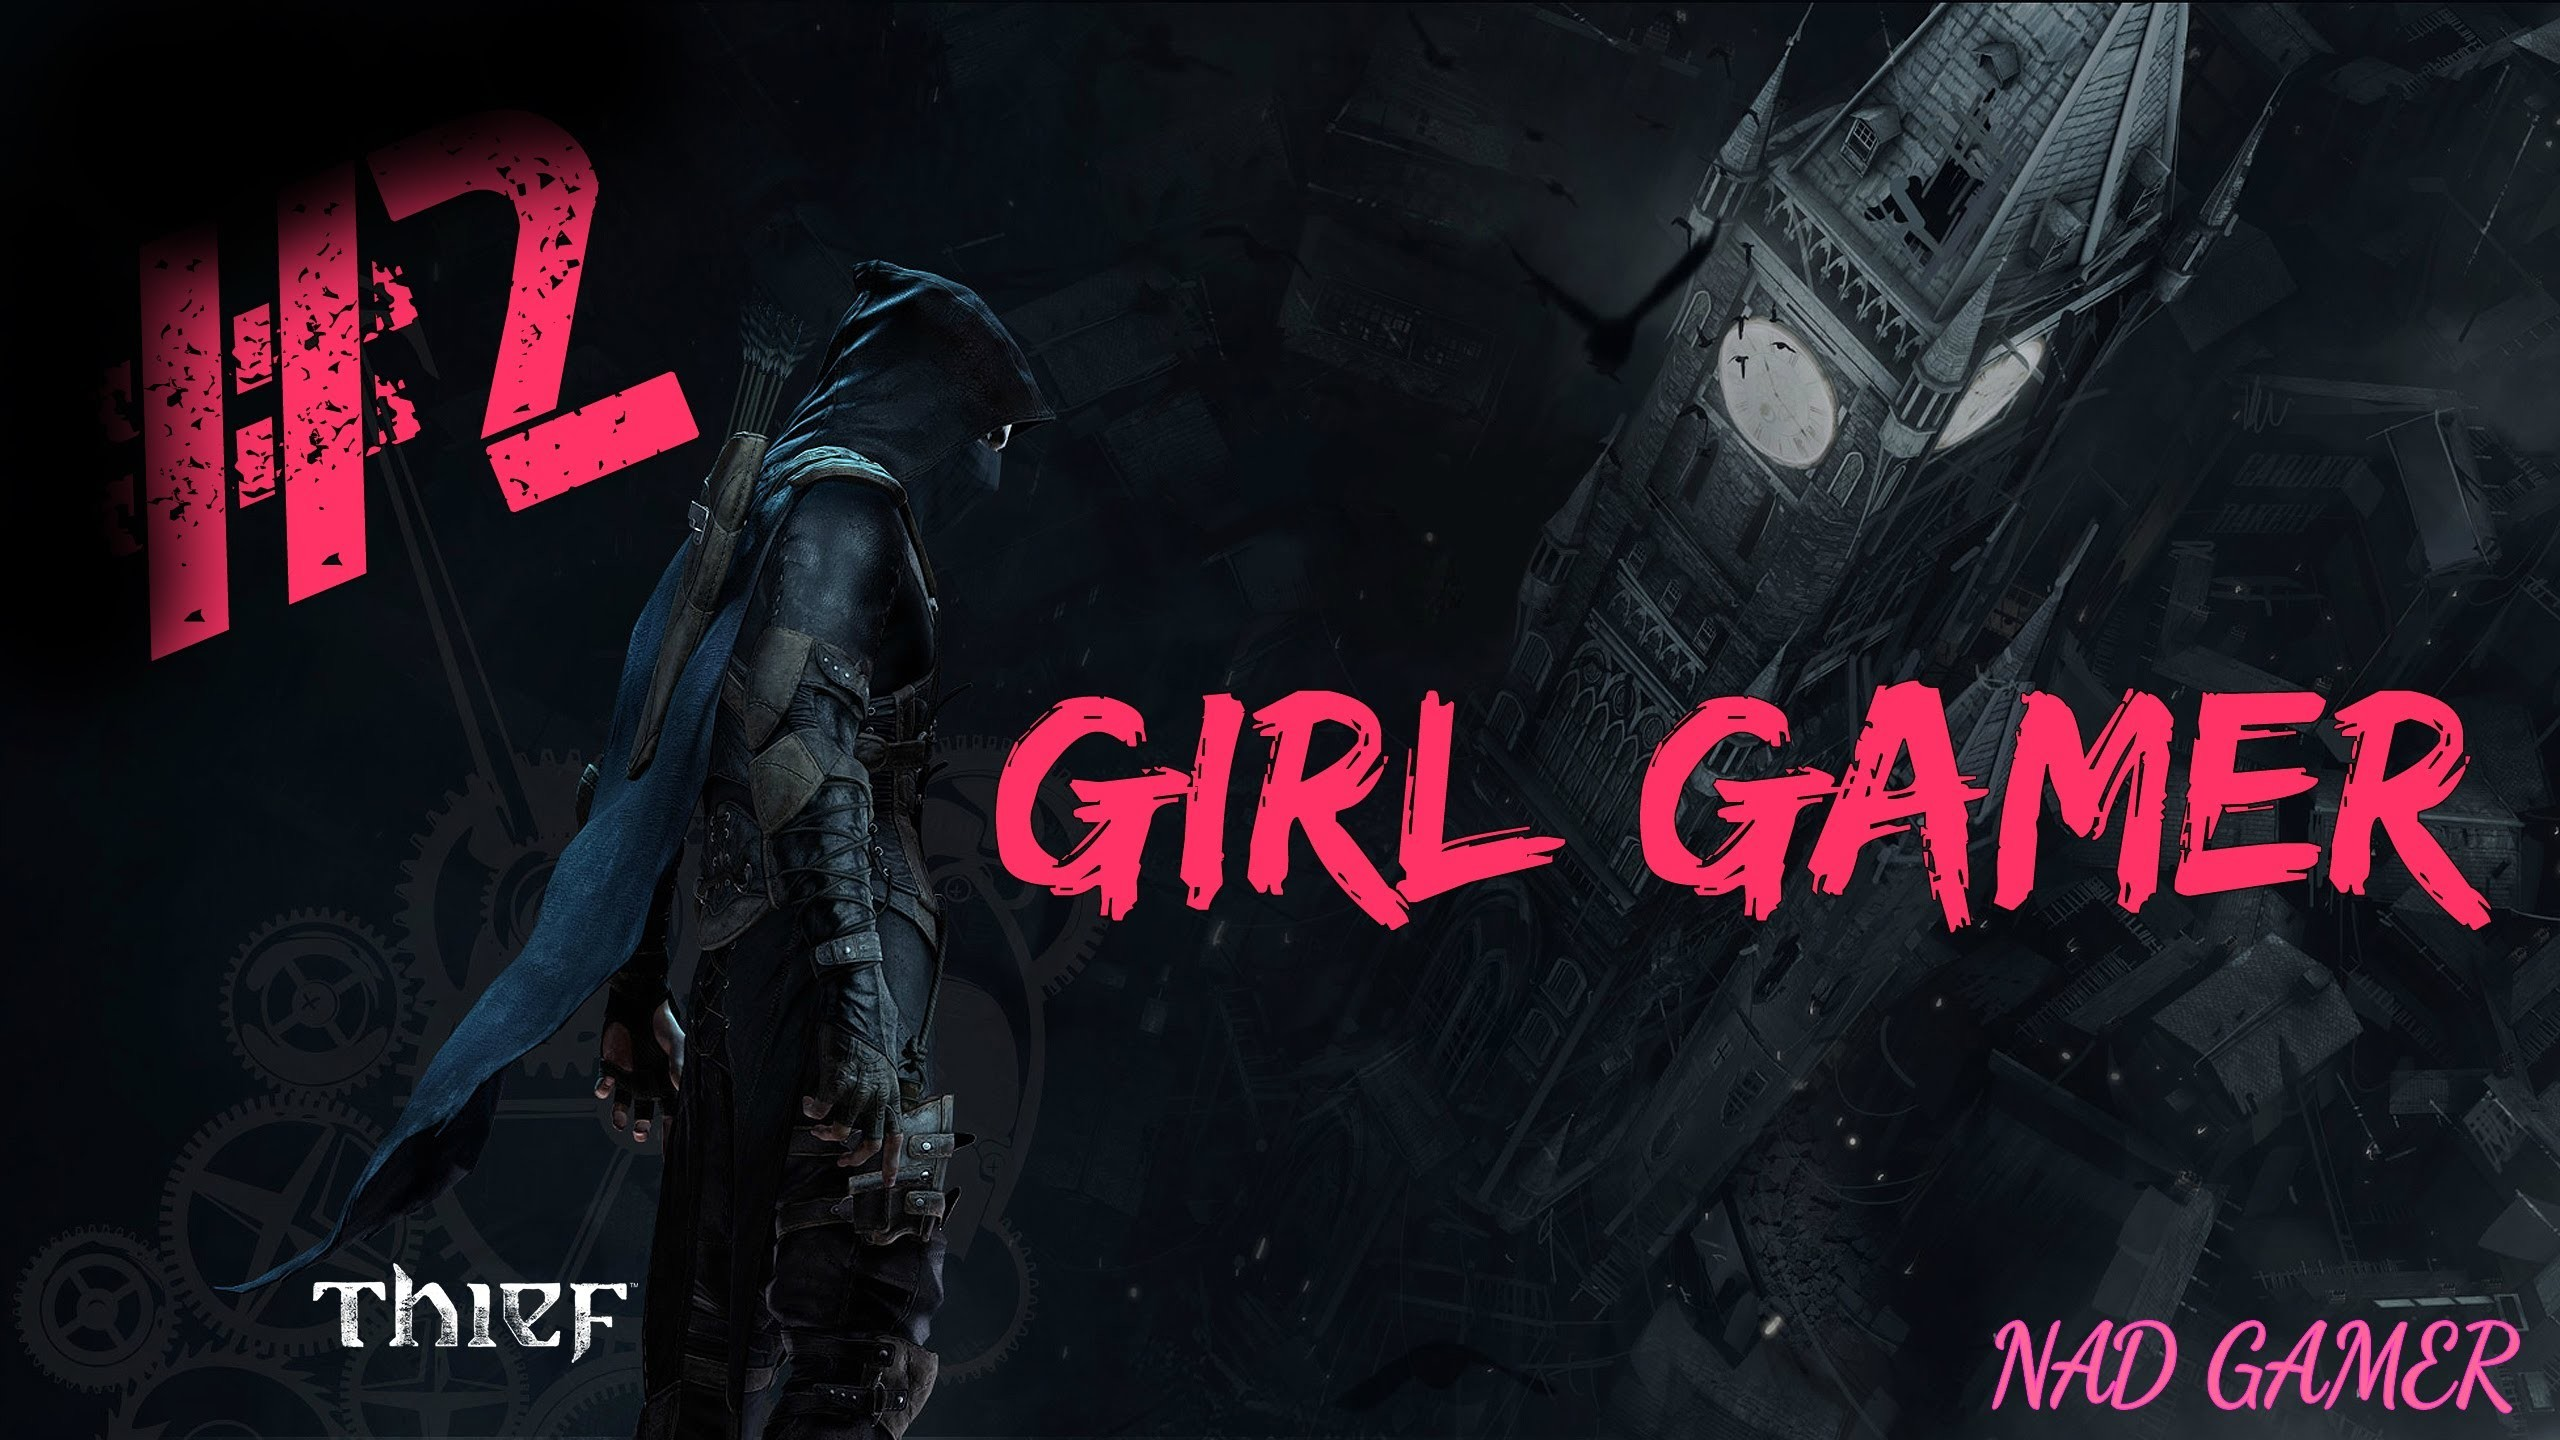 Res: 2560x1440, NAD GAMER - Thief #2 ( GIRL GAMER )